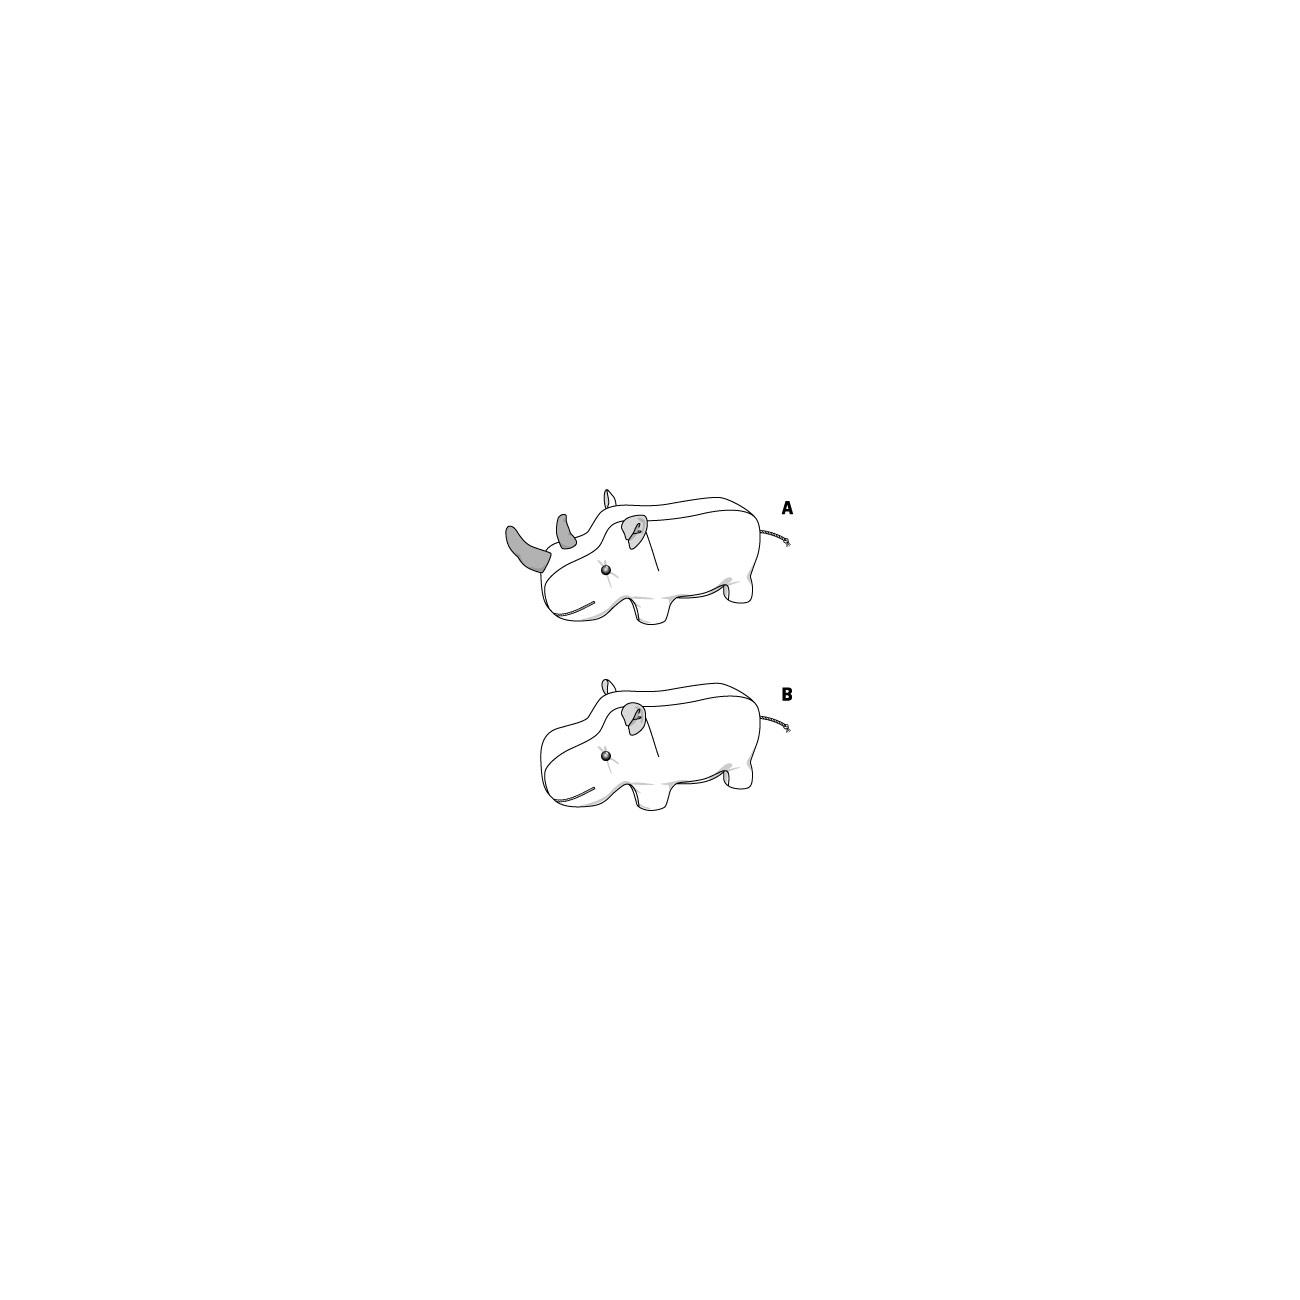 burda schnitt 6560 kuscheltier nashorn nilpferd. Black Bedroom Furniture Sets. Home Design Ideas